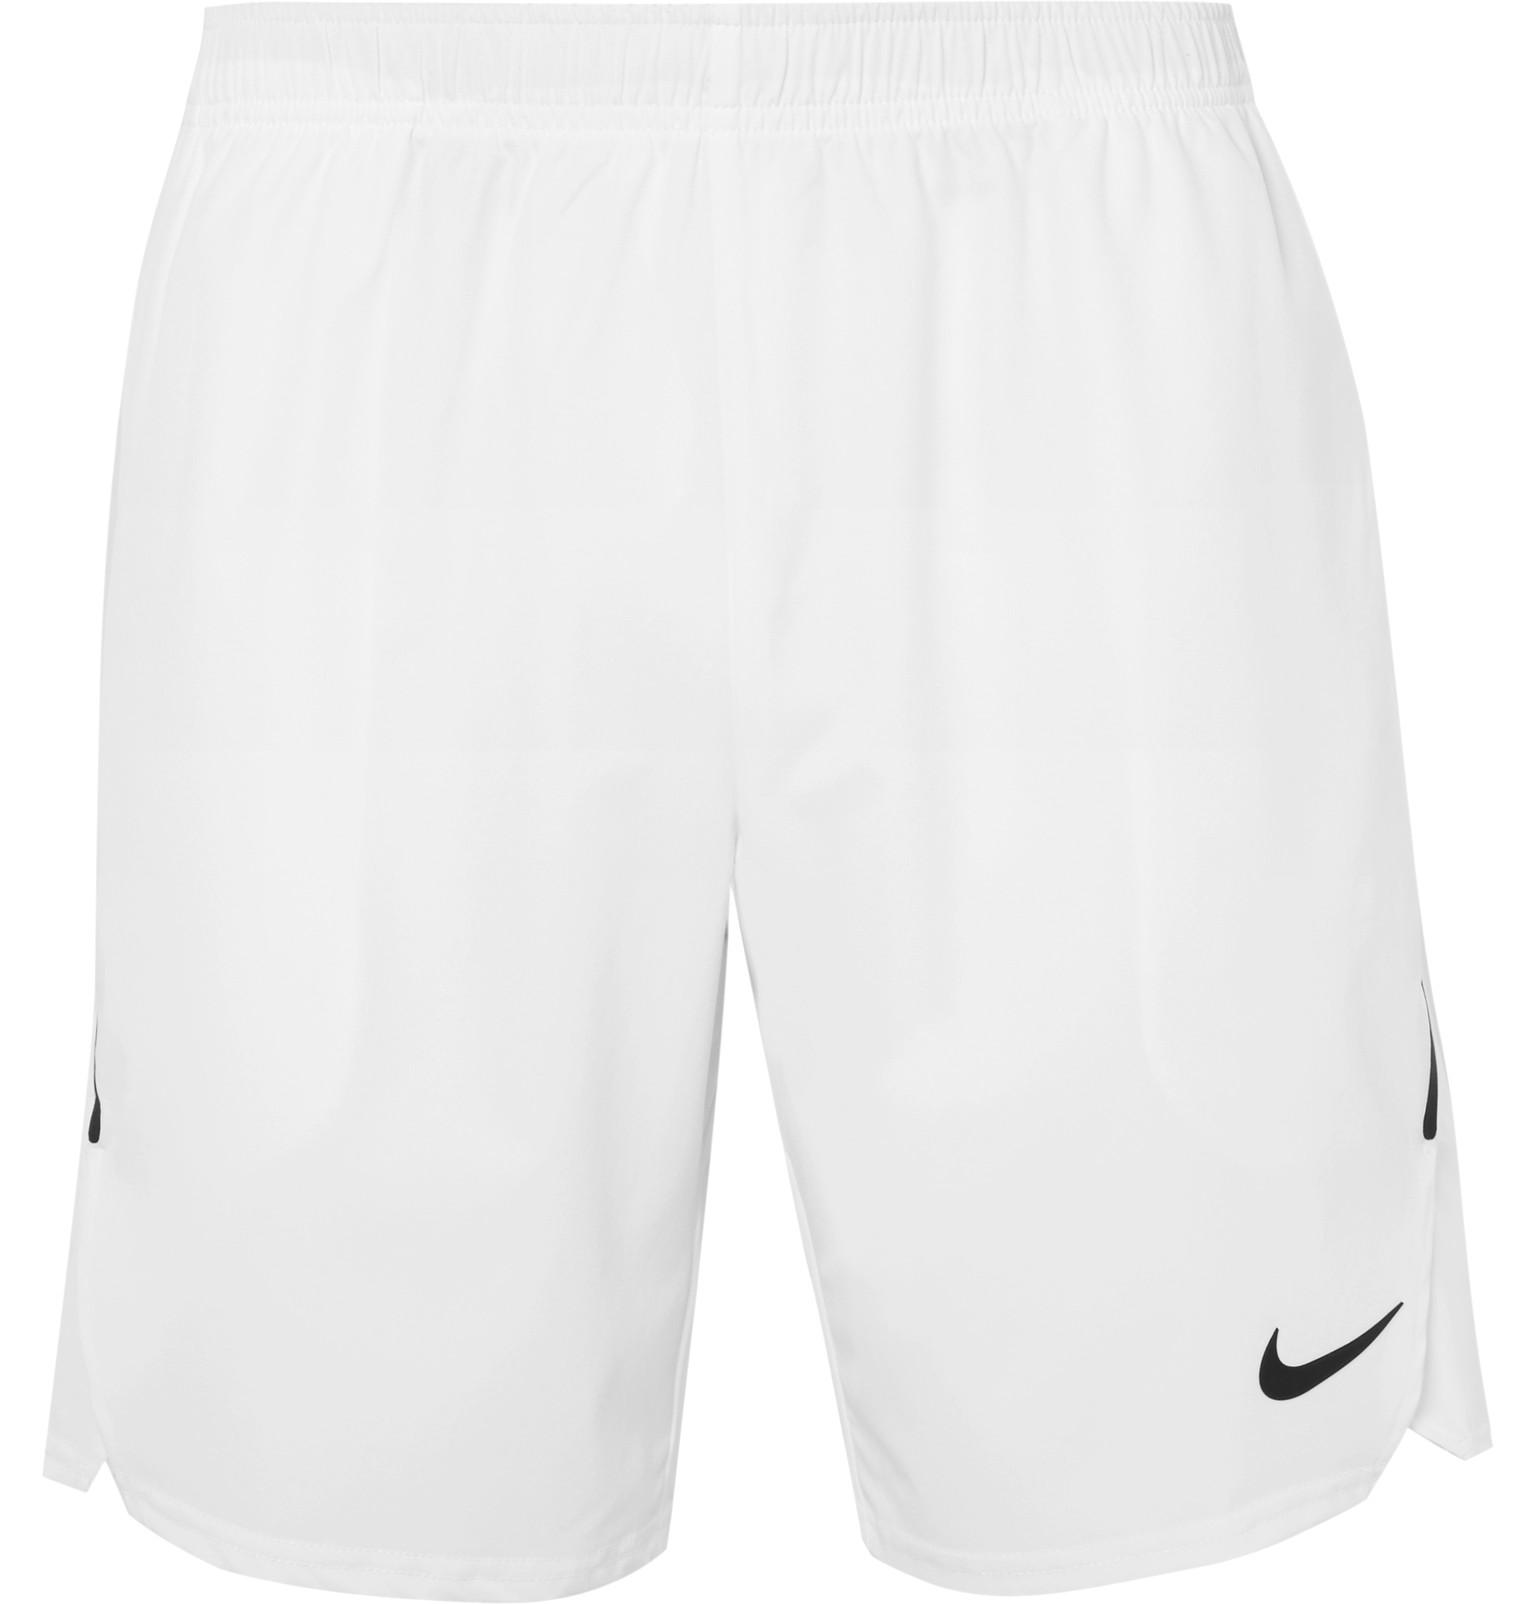 Tennis Nike Slim Dri Fit Tennis NikeCourt Ace FIT Shorts Flex I9WED2eYHb